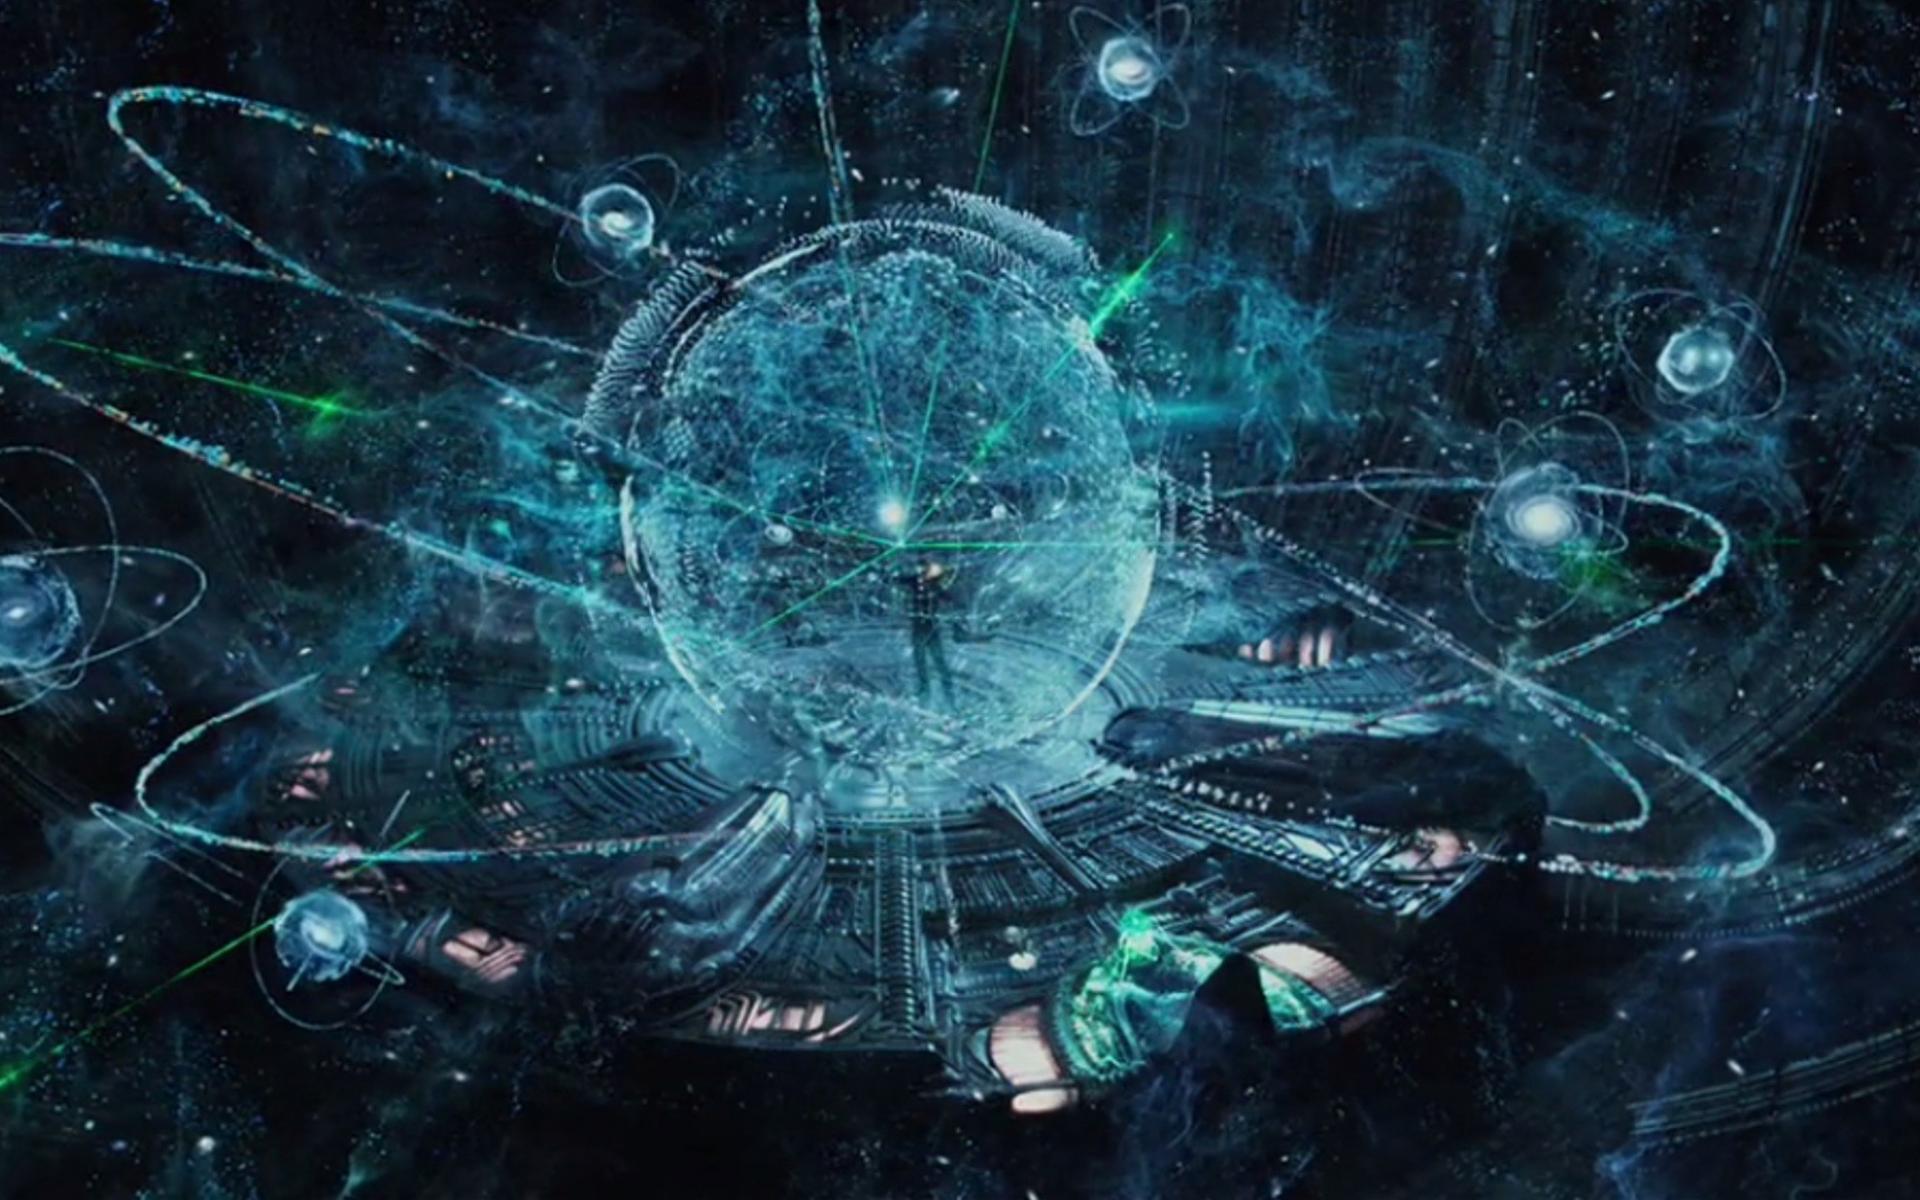 Alien spaceship wallpaper wallpapersafari for 3d outer space map